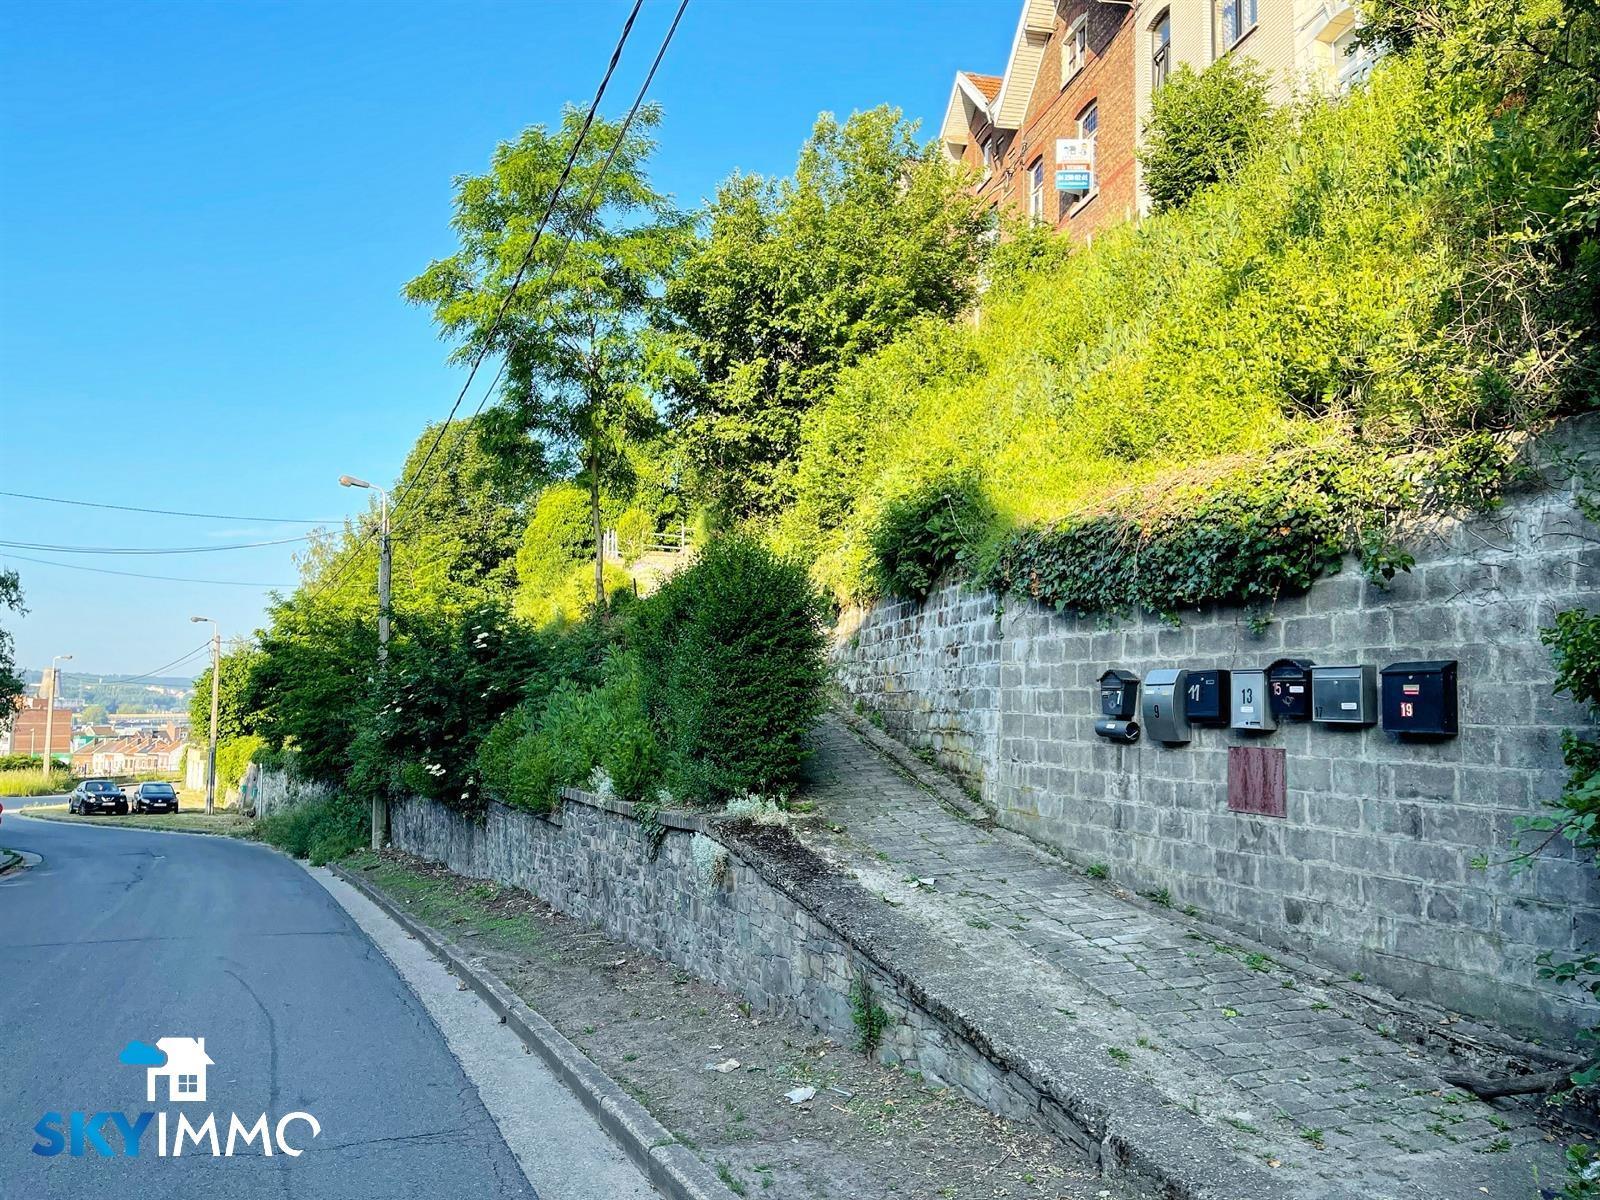 Maison - Seraing Jemeppesur-Meuse - #4383857-24